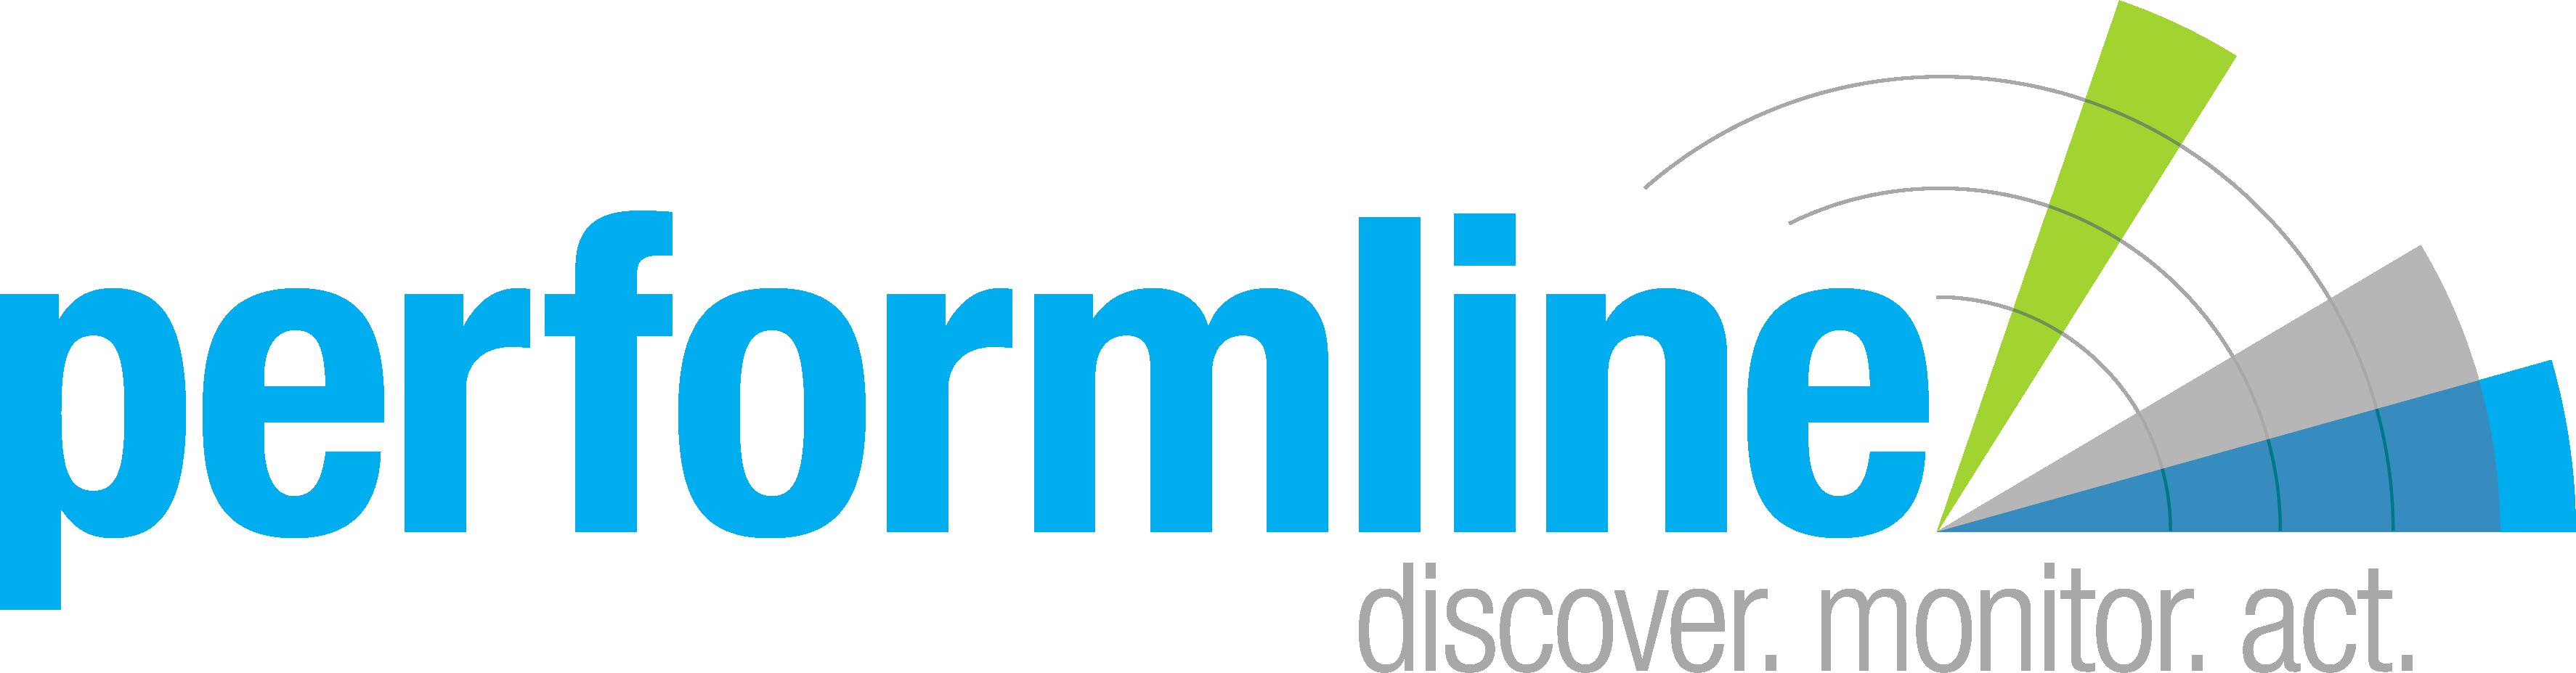 PL_Logo_Blue-Gray_Tagline_FINAL